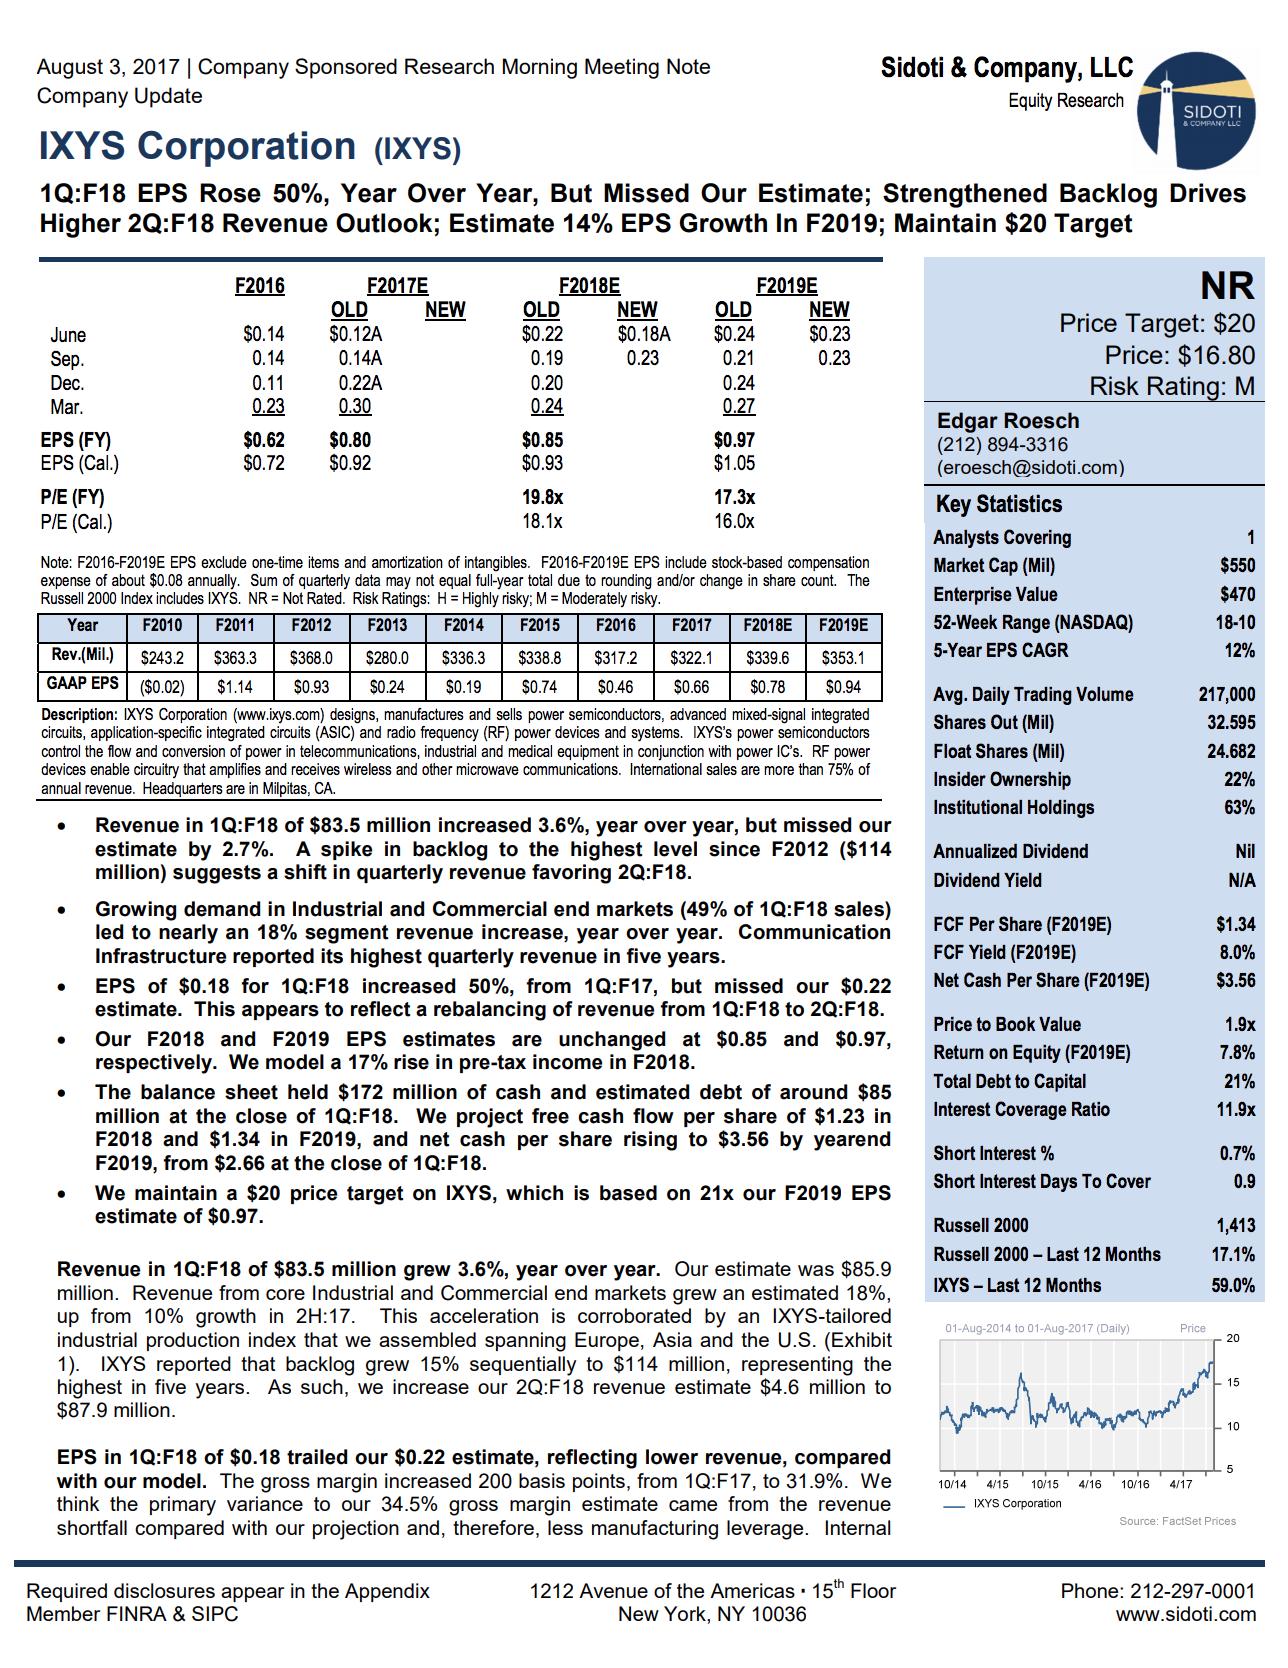 Earnings Report: August 3, 2017